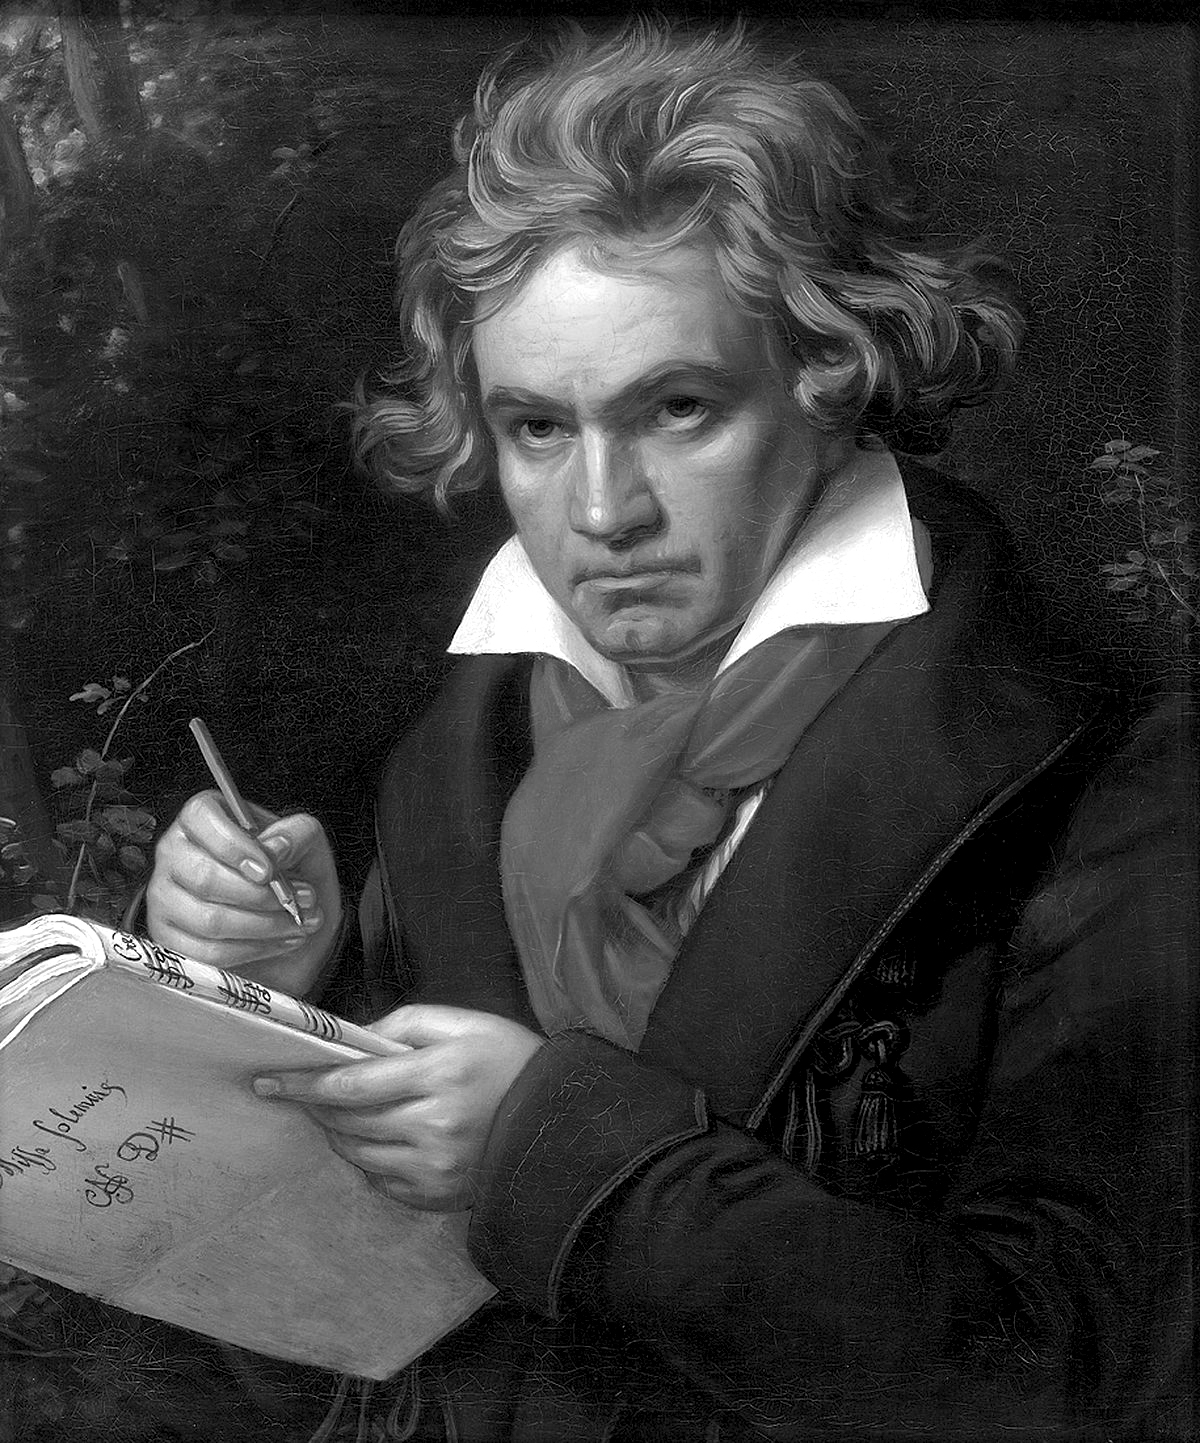 (Ludwig van Beethoven, composer)